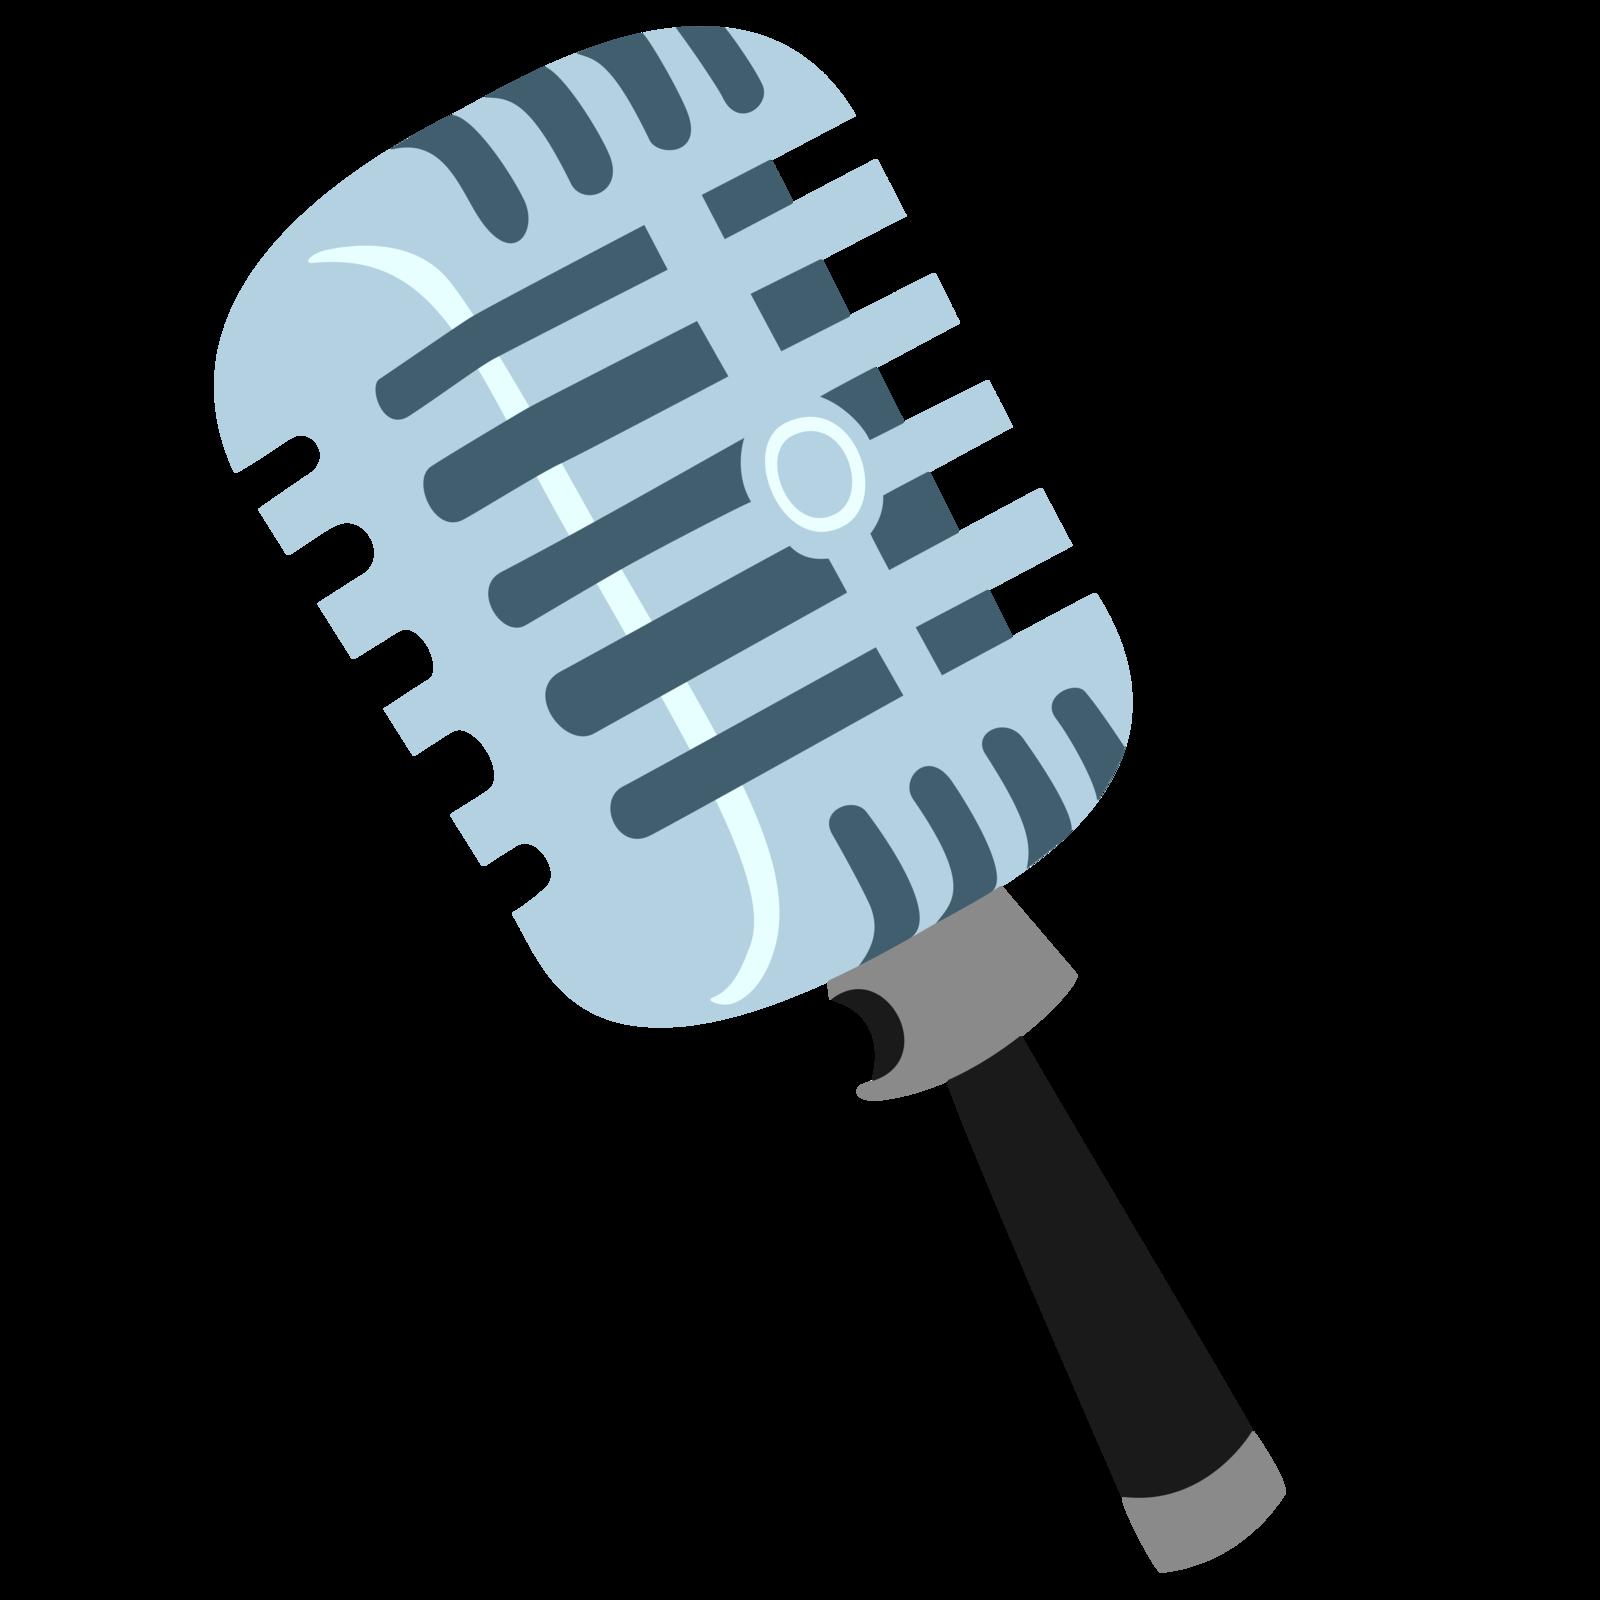 Microphone clipart sparkle.  huge freebie download